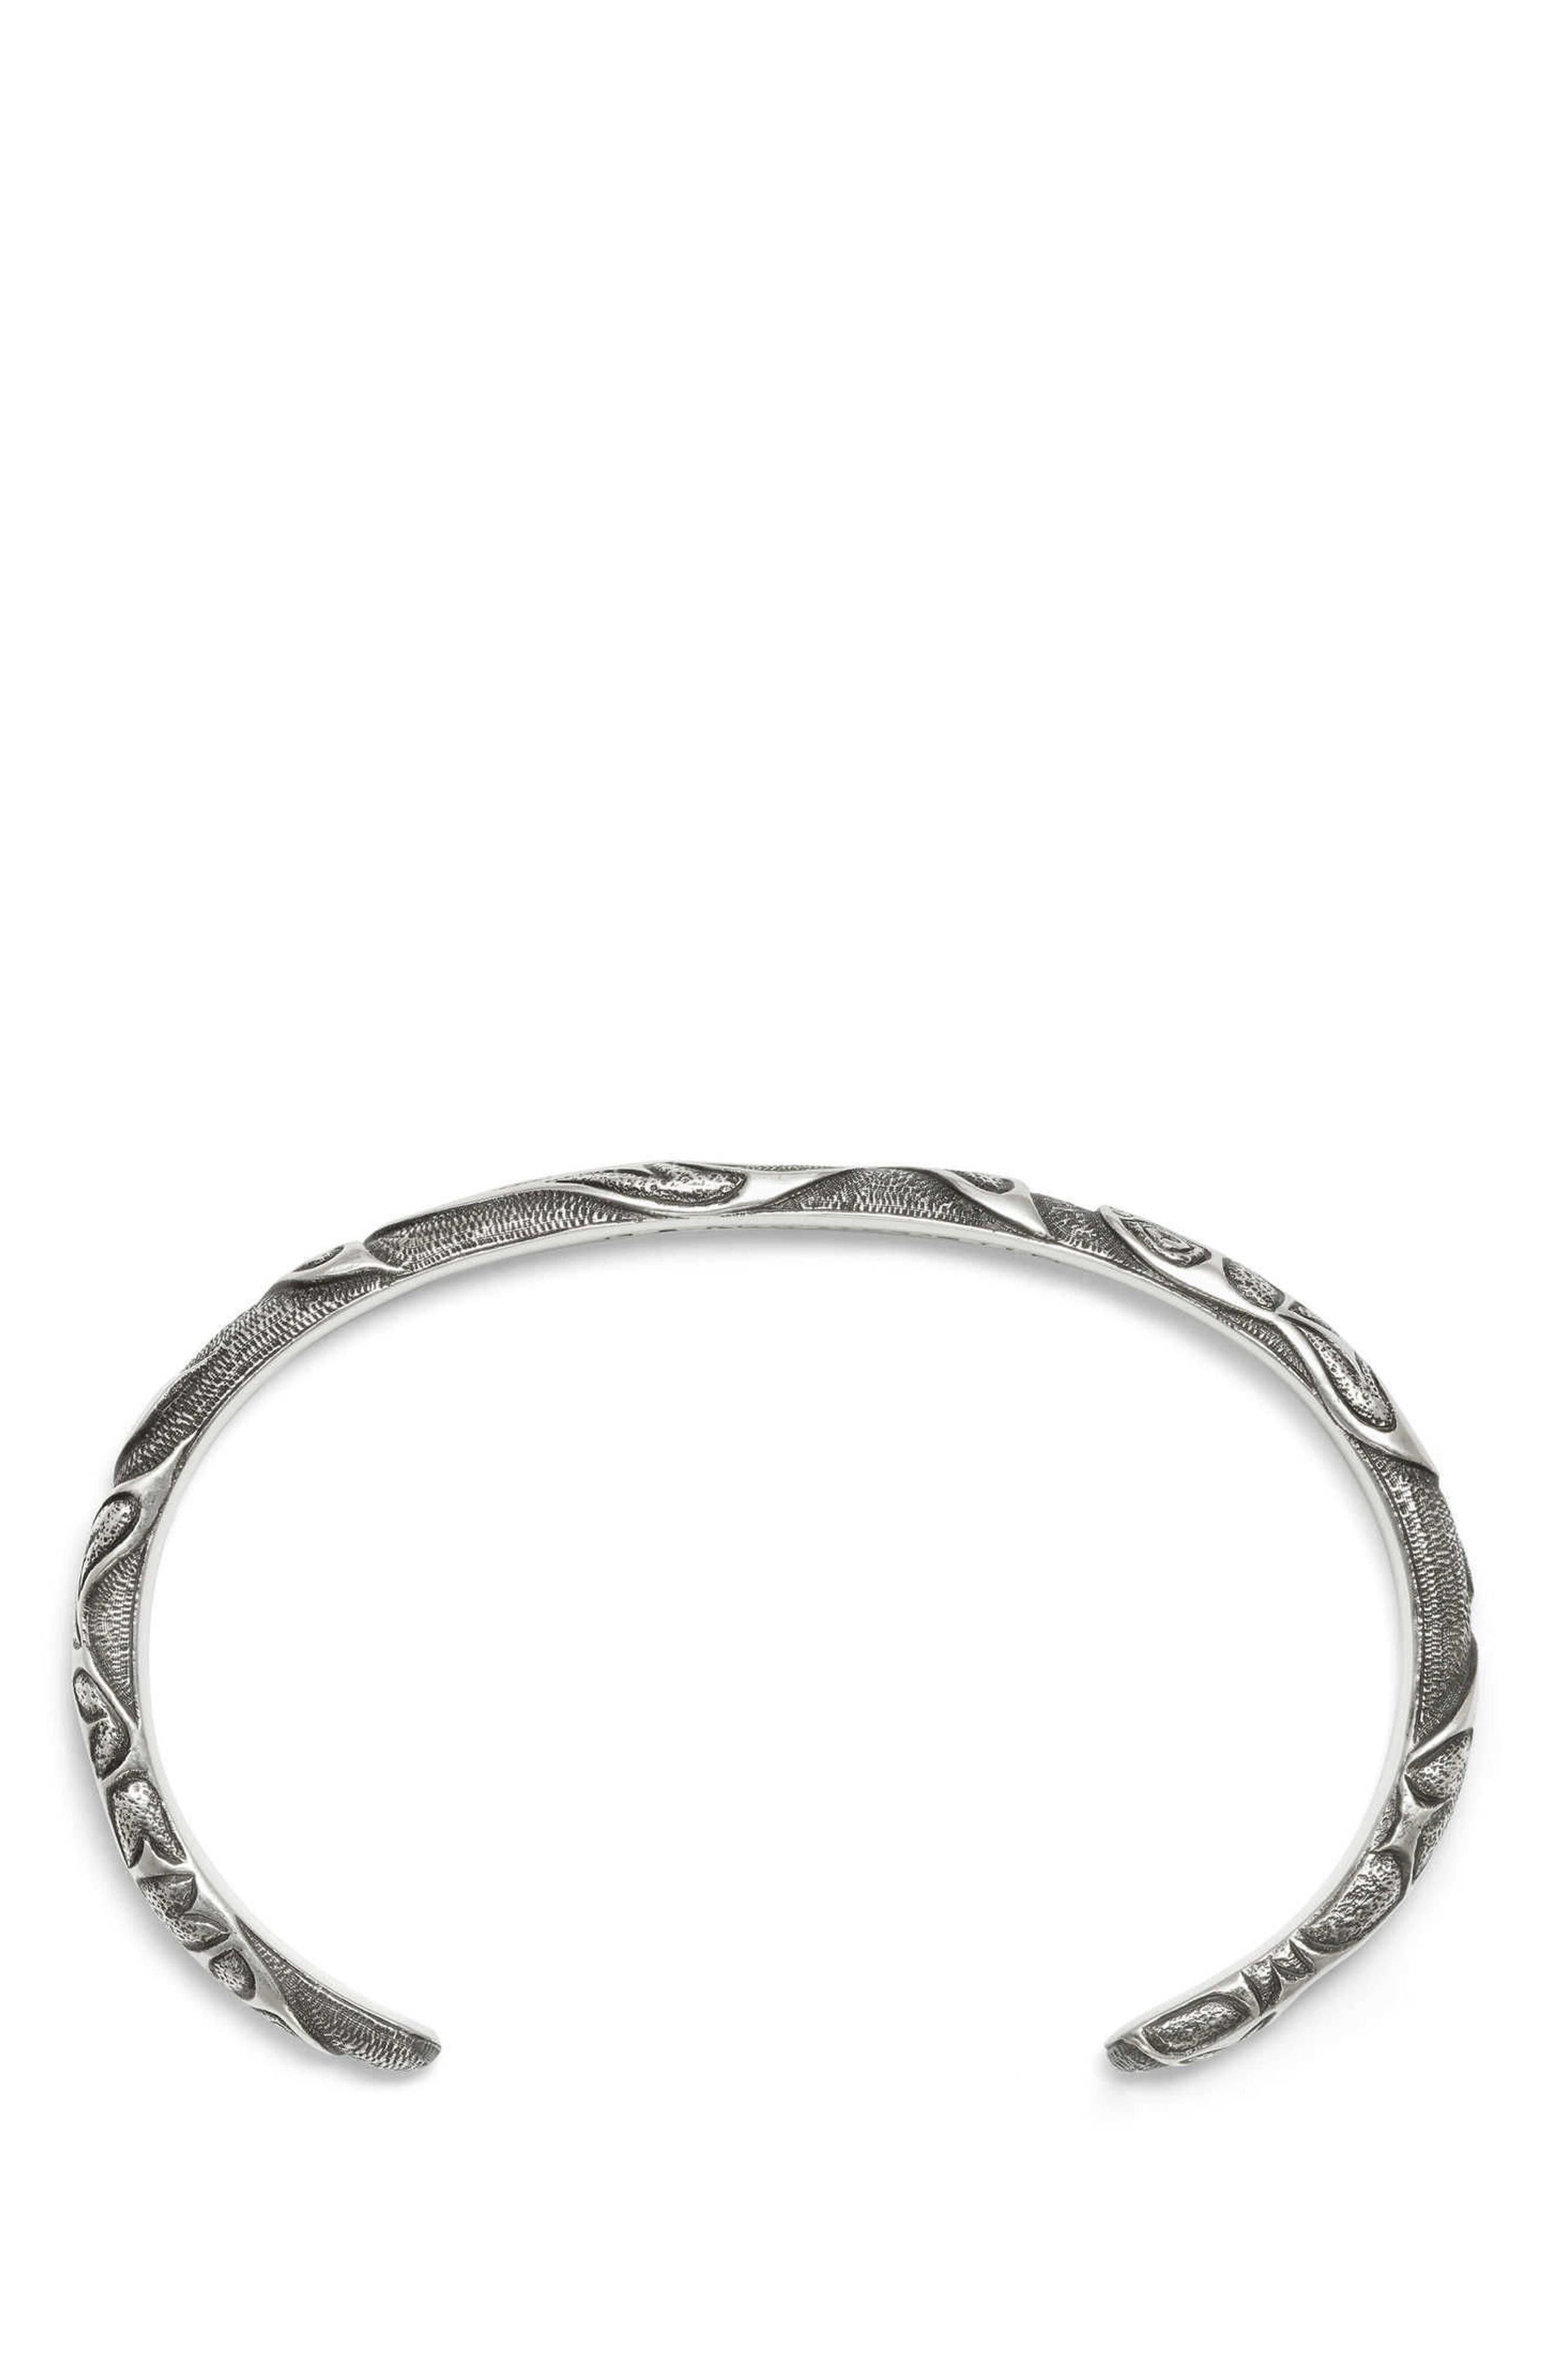 DAVID YURMAN, Northwest Narrow Cuff Bracelet, Alternate thumbnail 2, color, SILVER